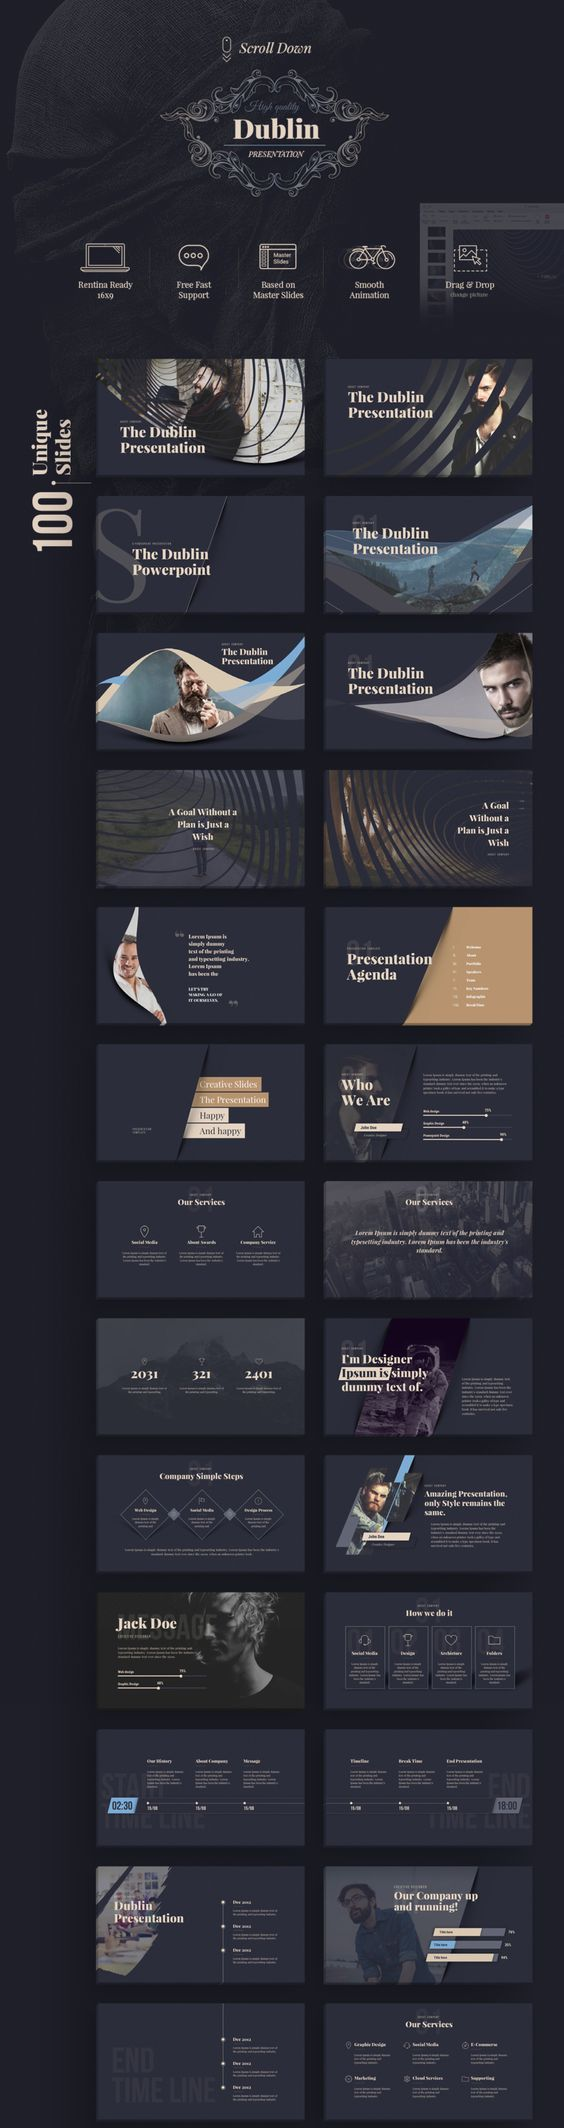 100 Unique & specially designed slides: